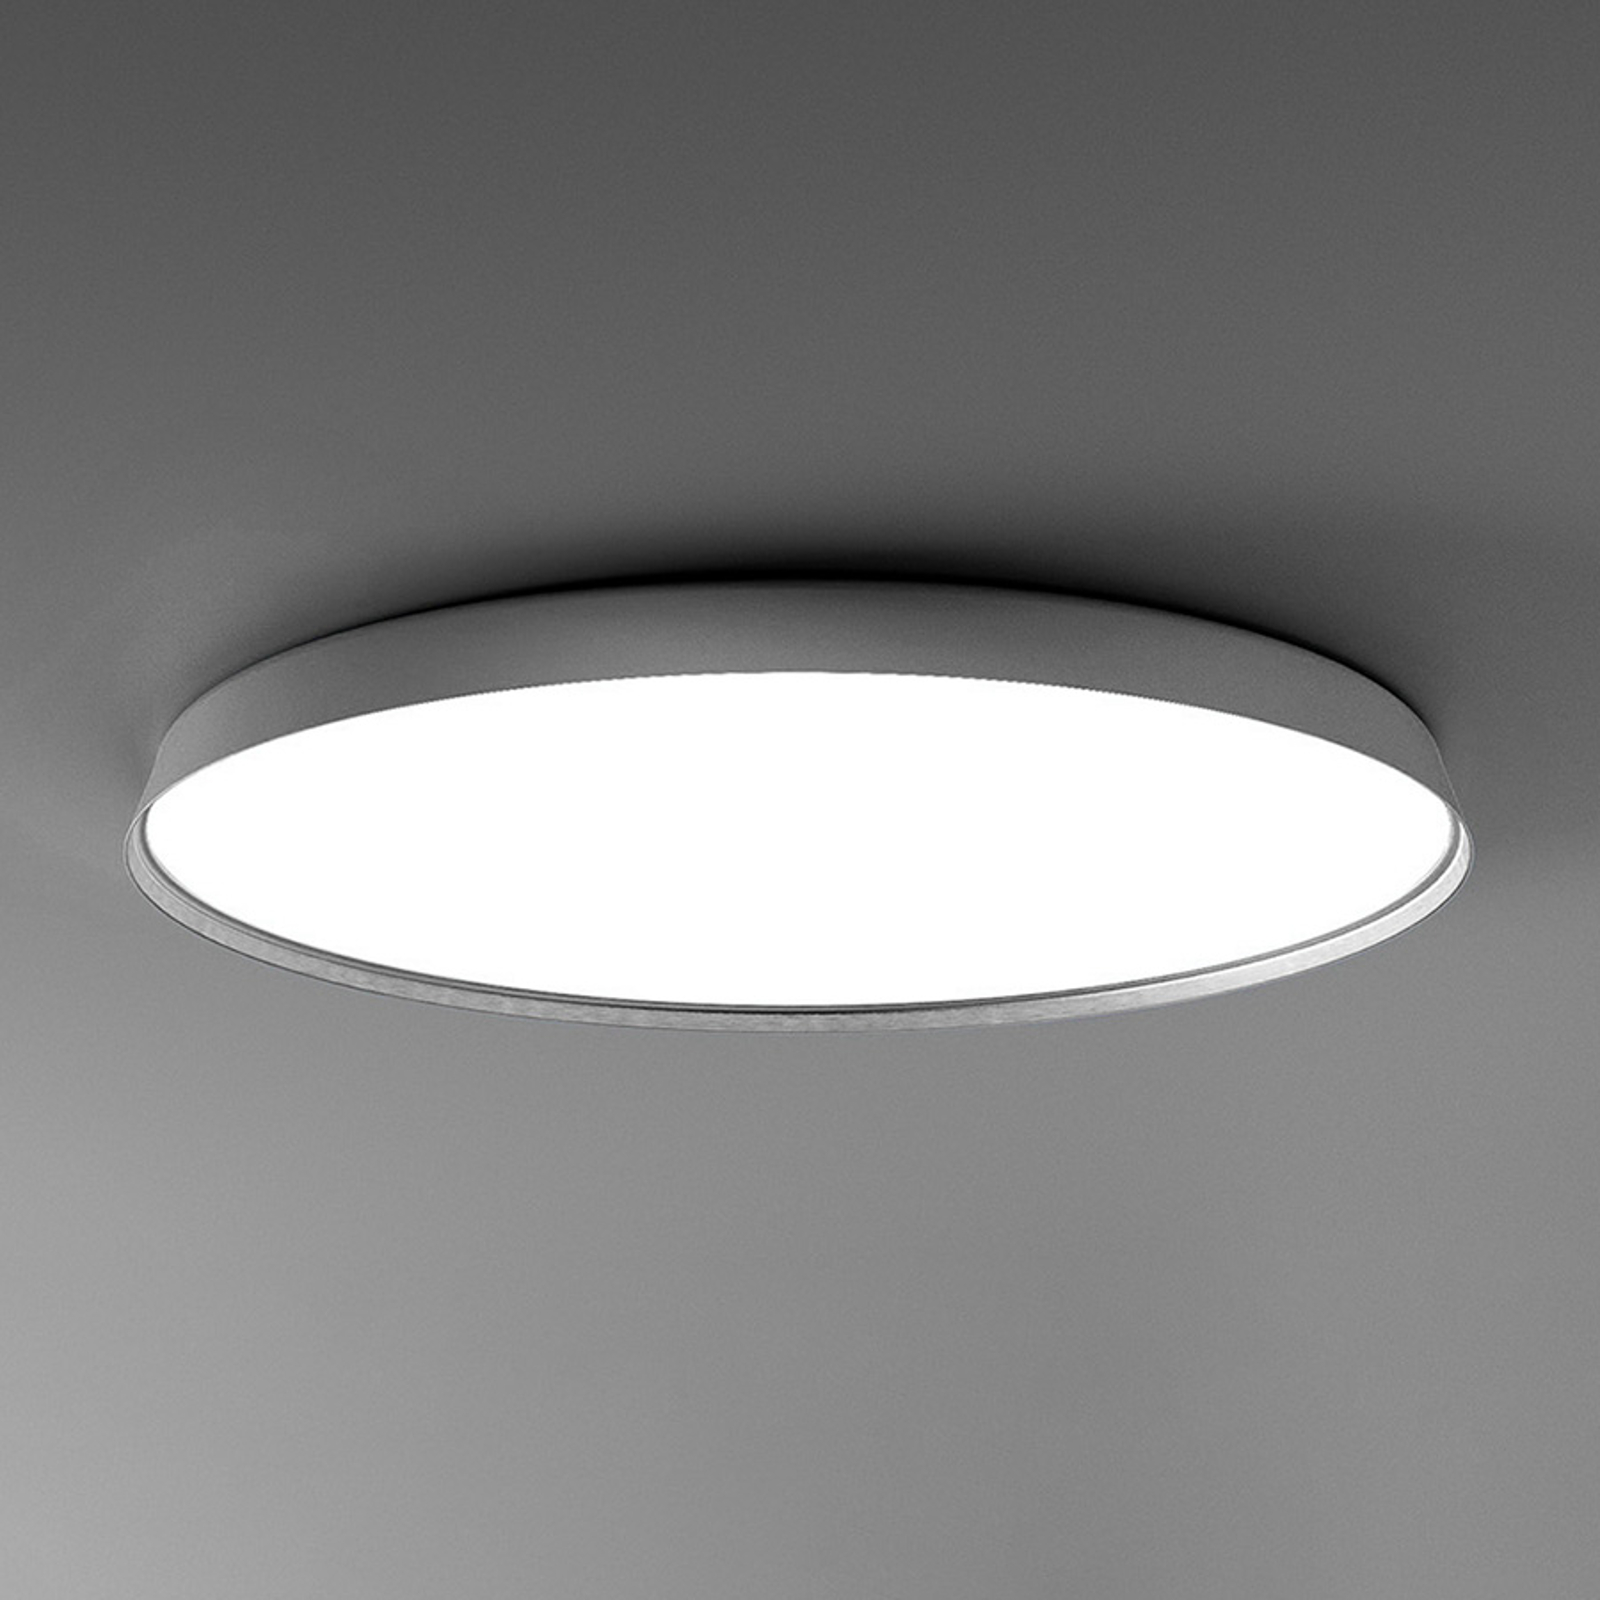 Luceplan Compendium Plate lampa sufitowa LED